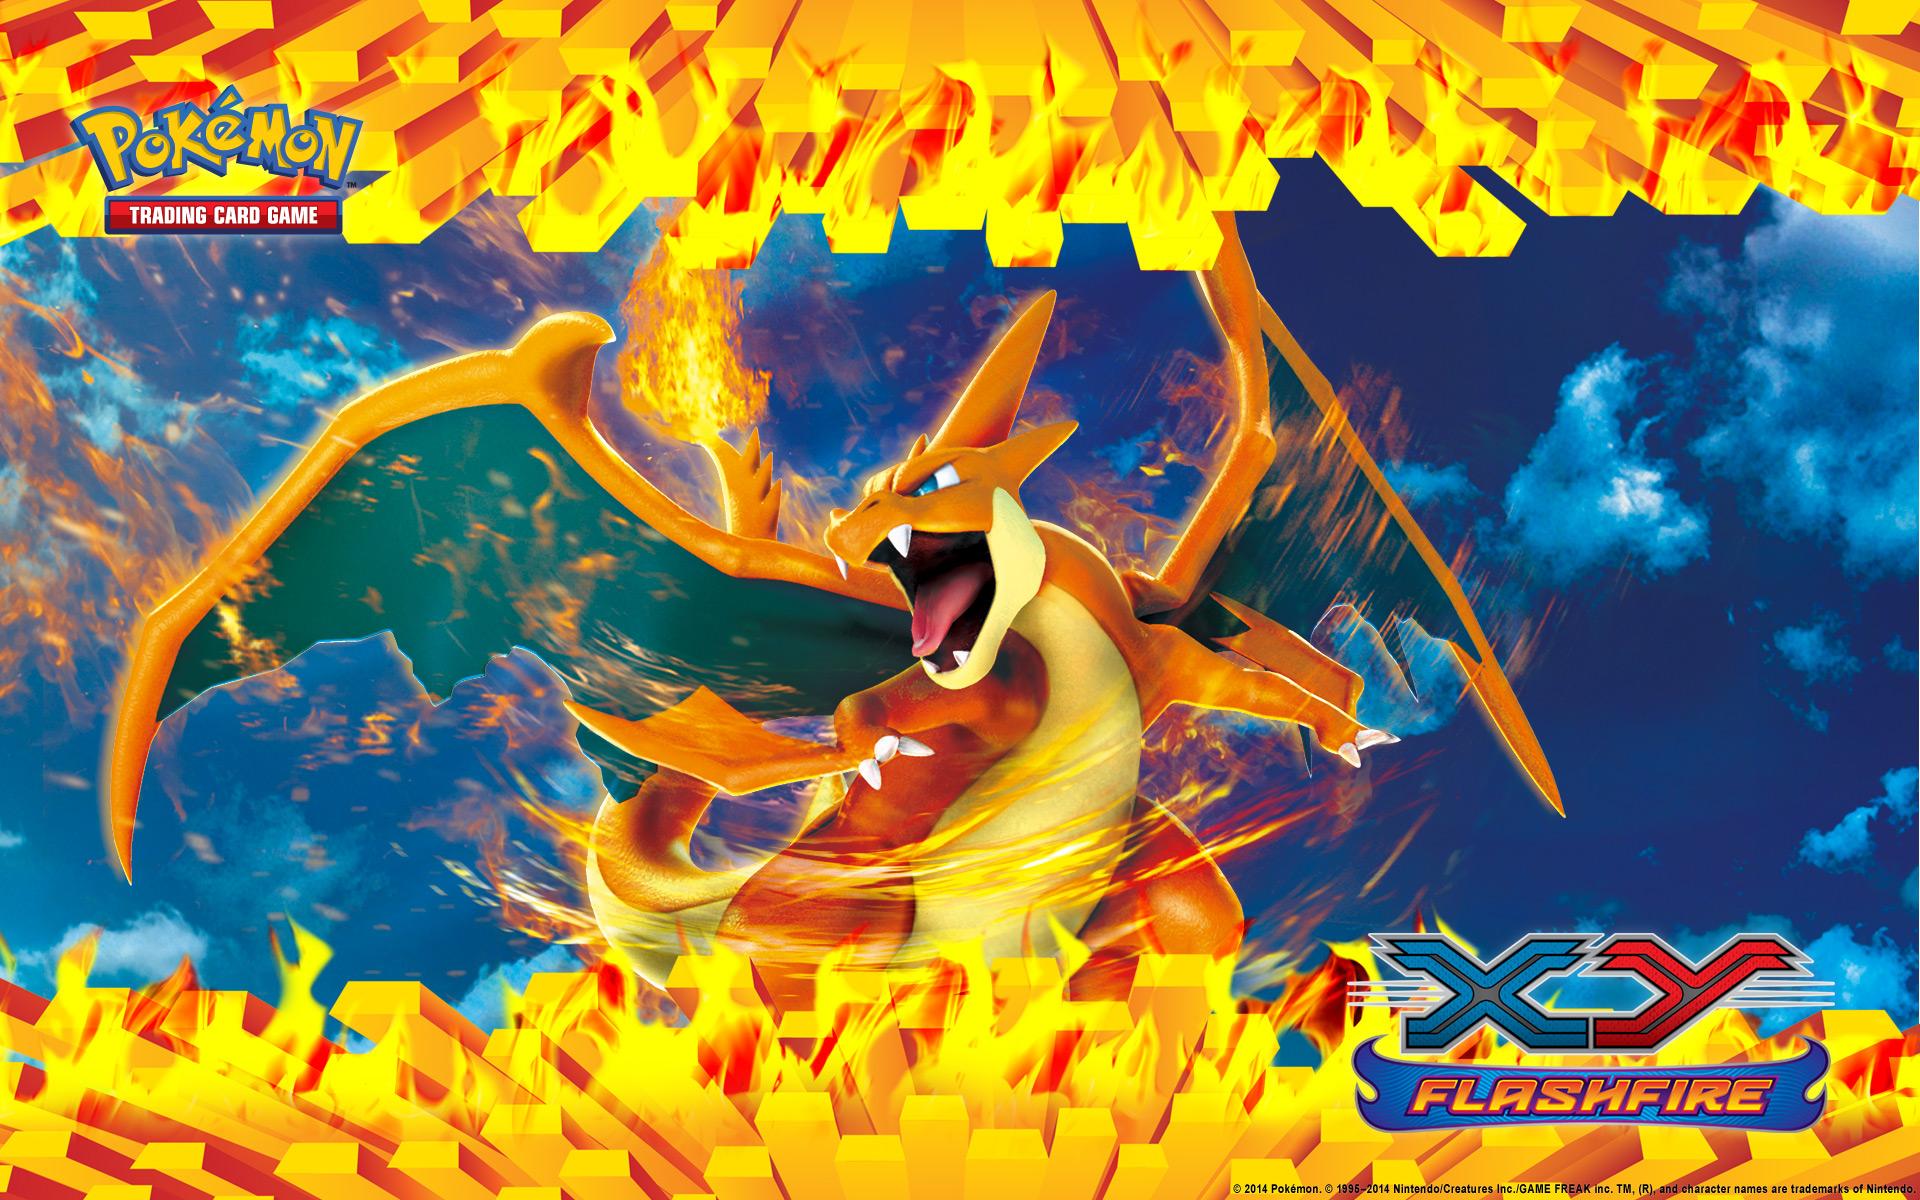 Pokemon TCG XY Flashfire Charizard Wallpaper